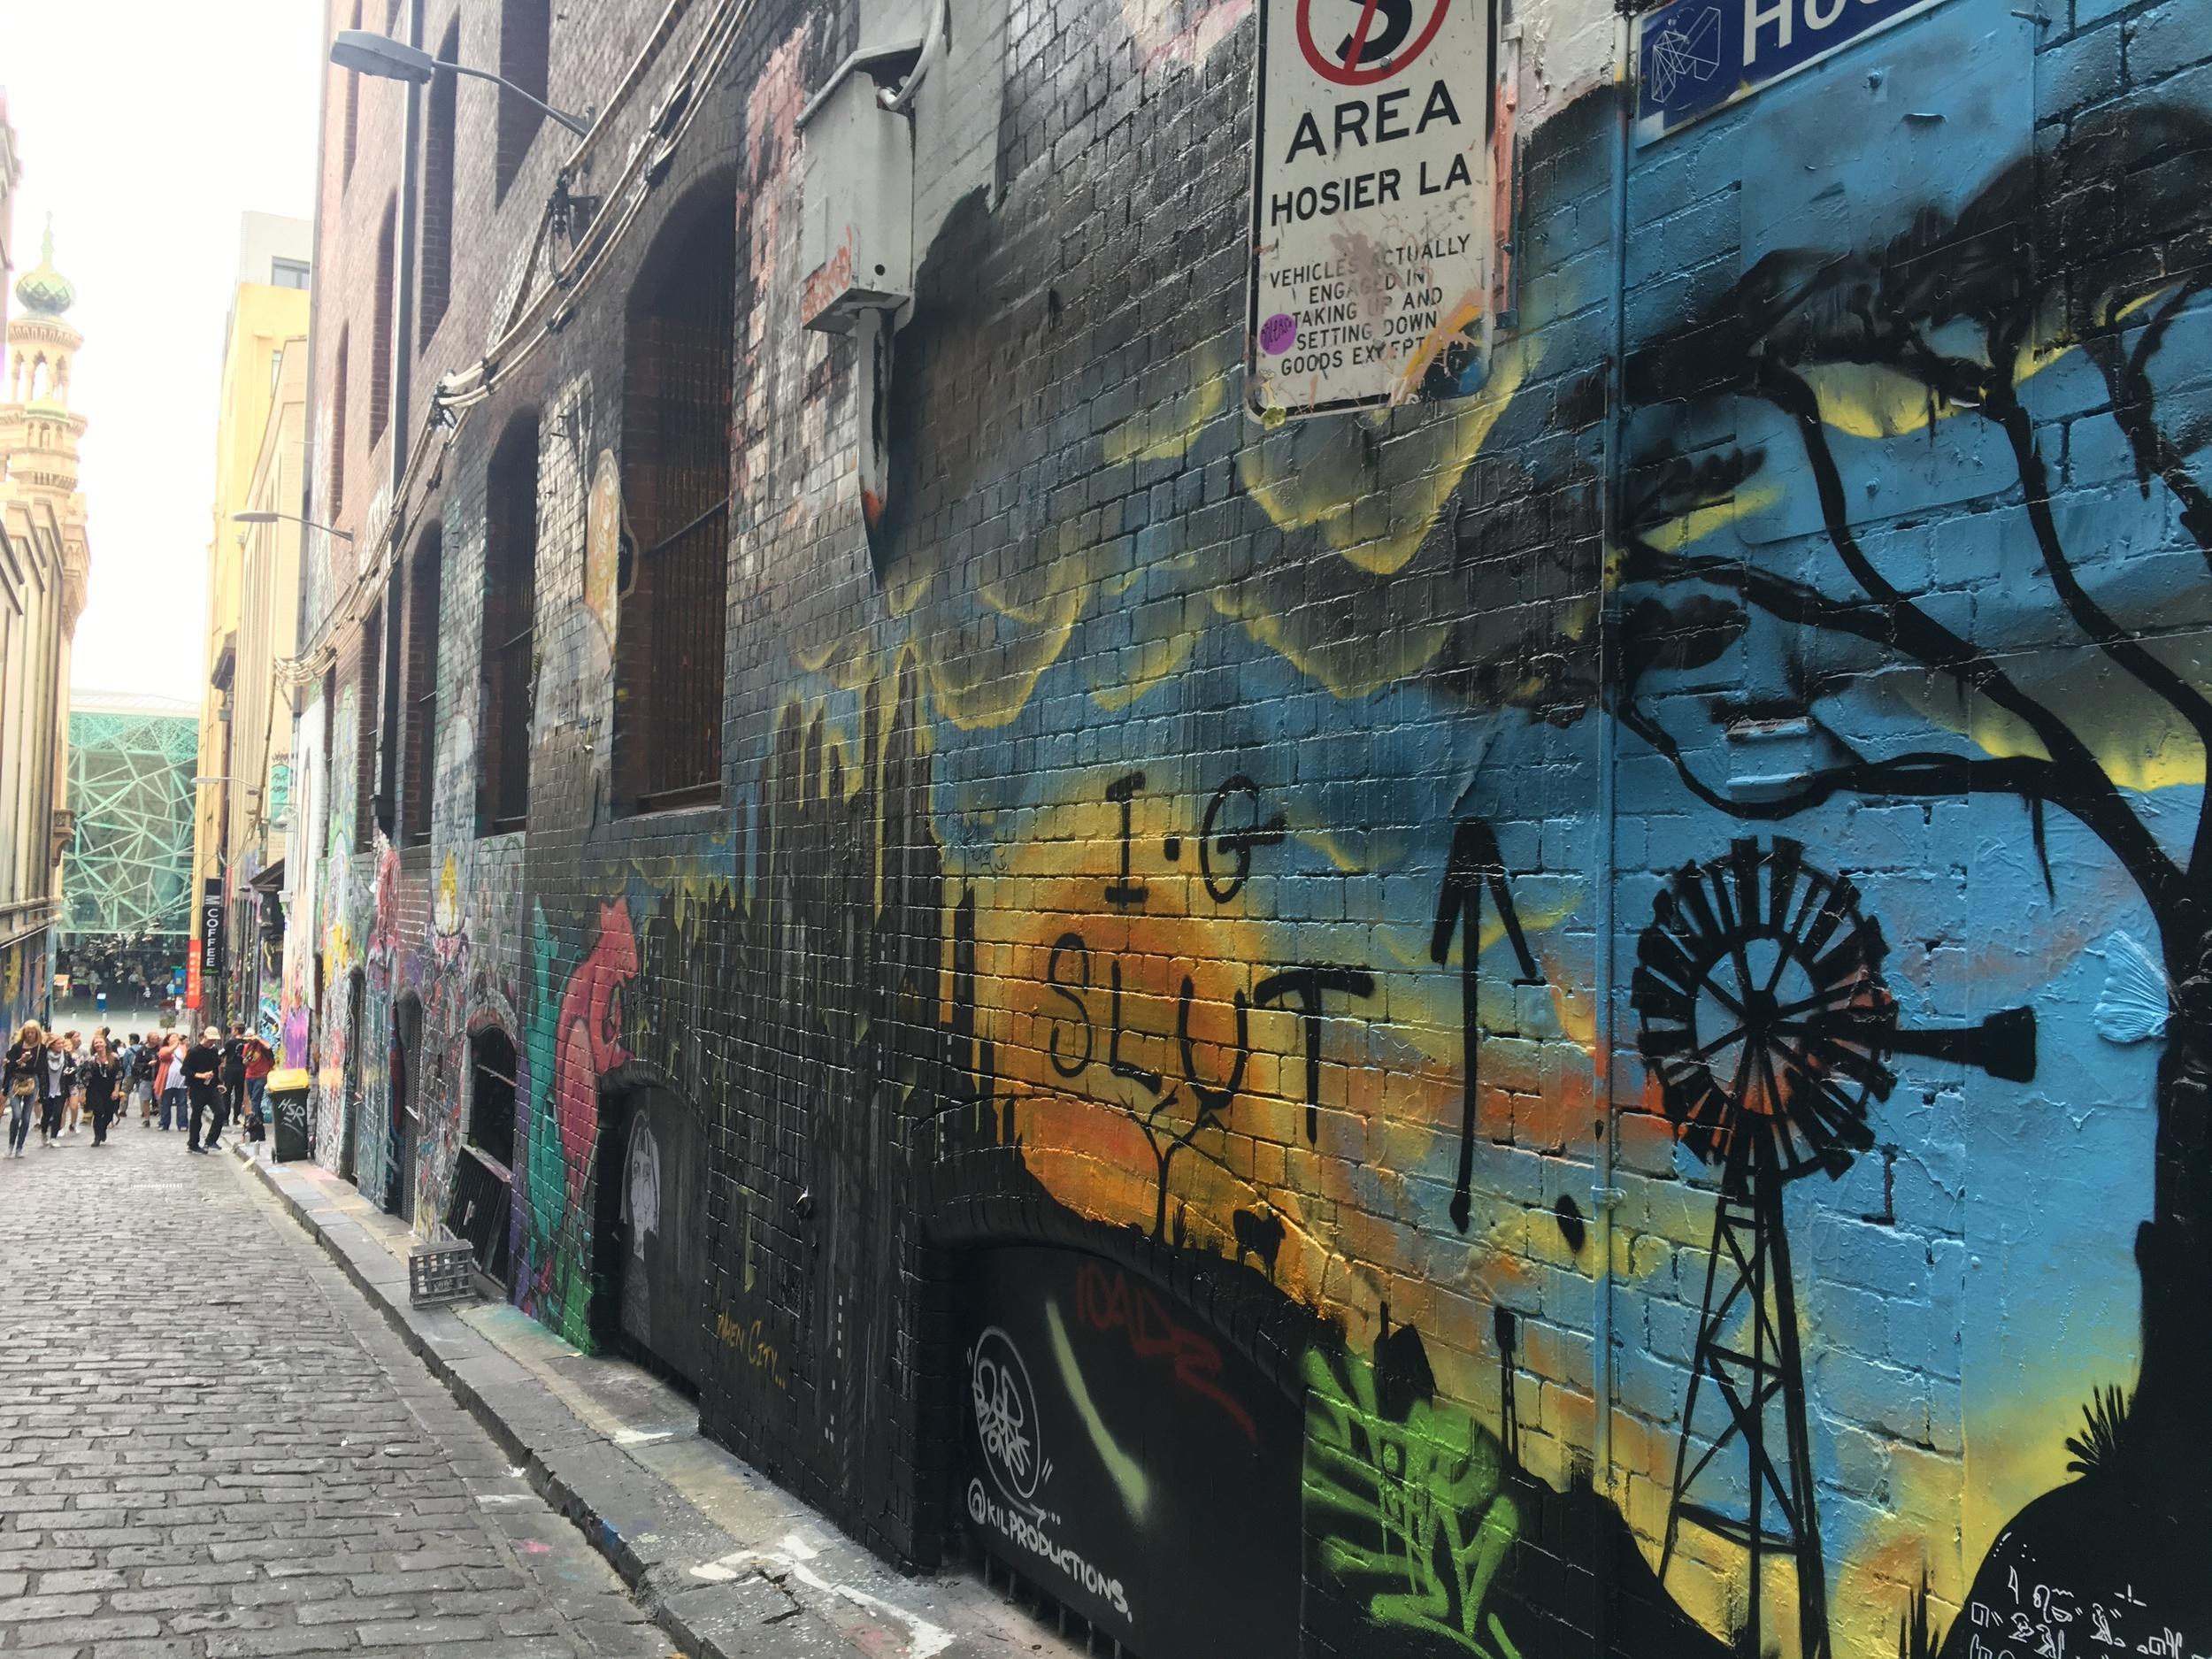 Aggressive street art